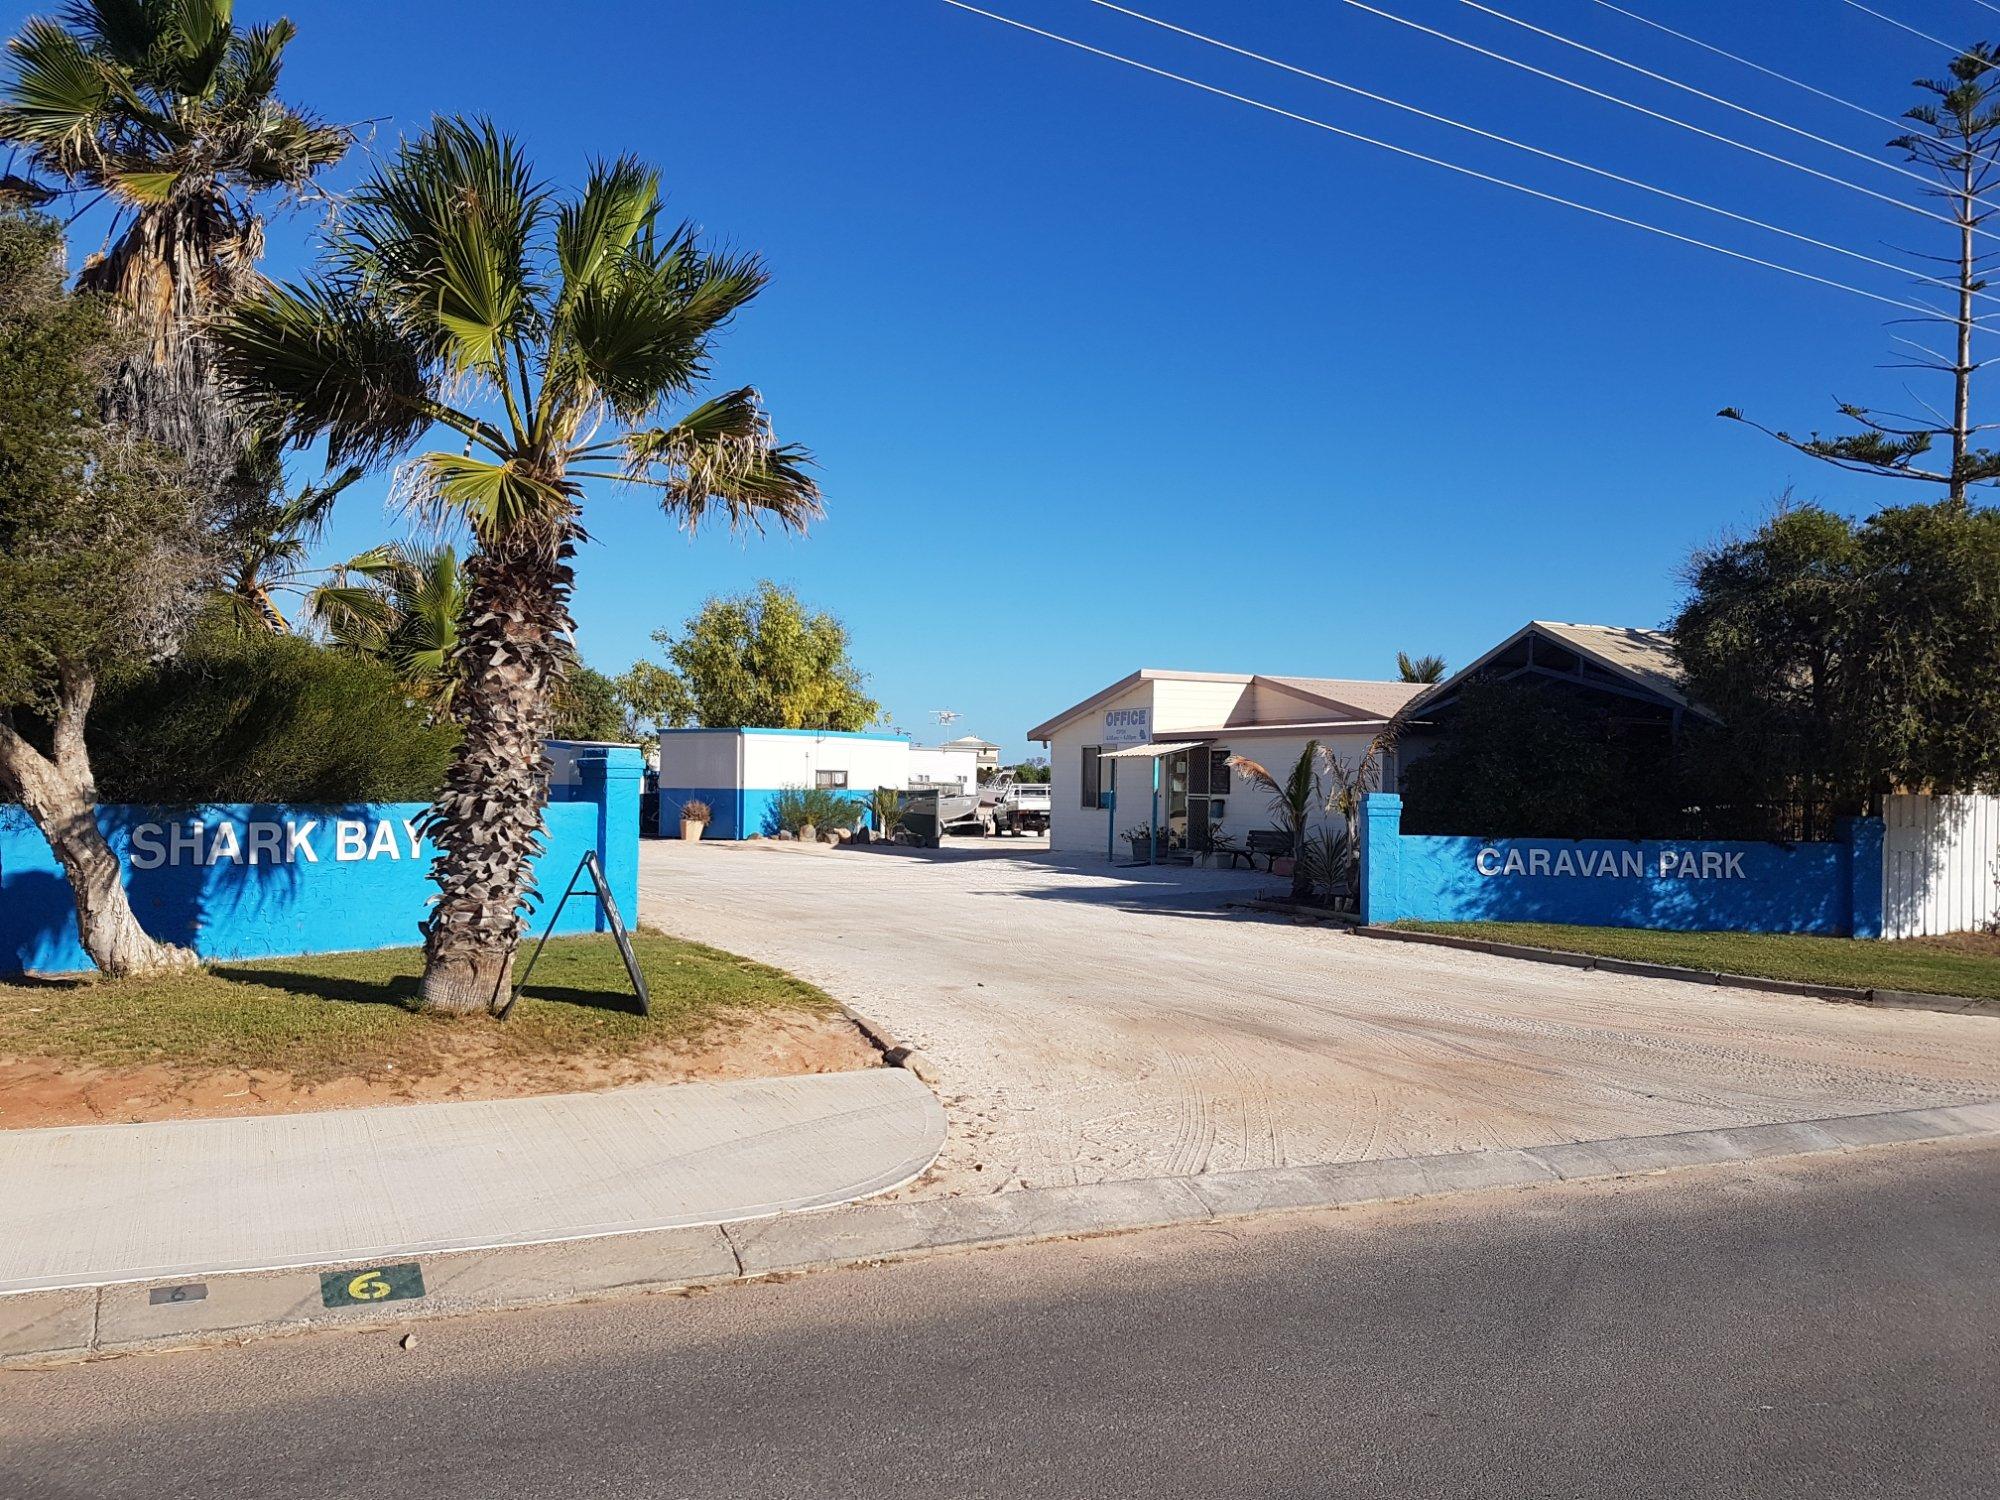 Shark Bay Caravan Park